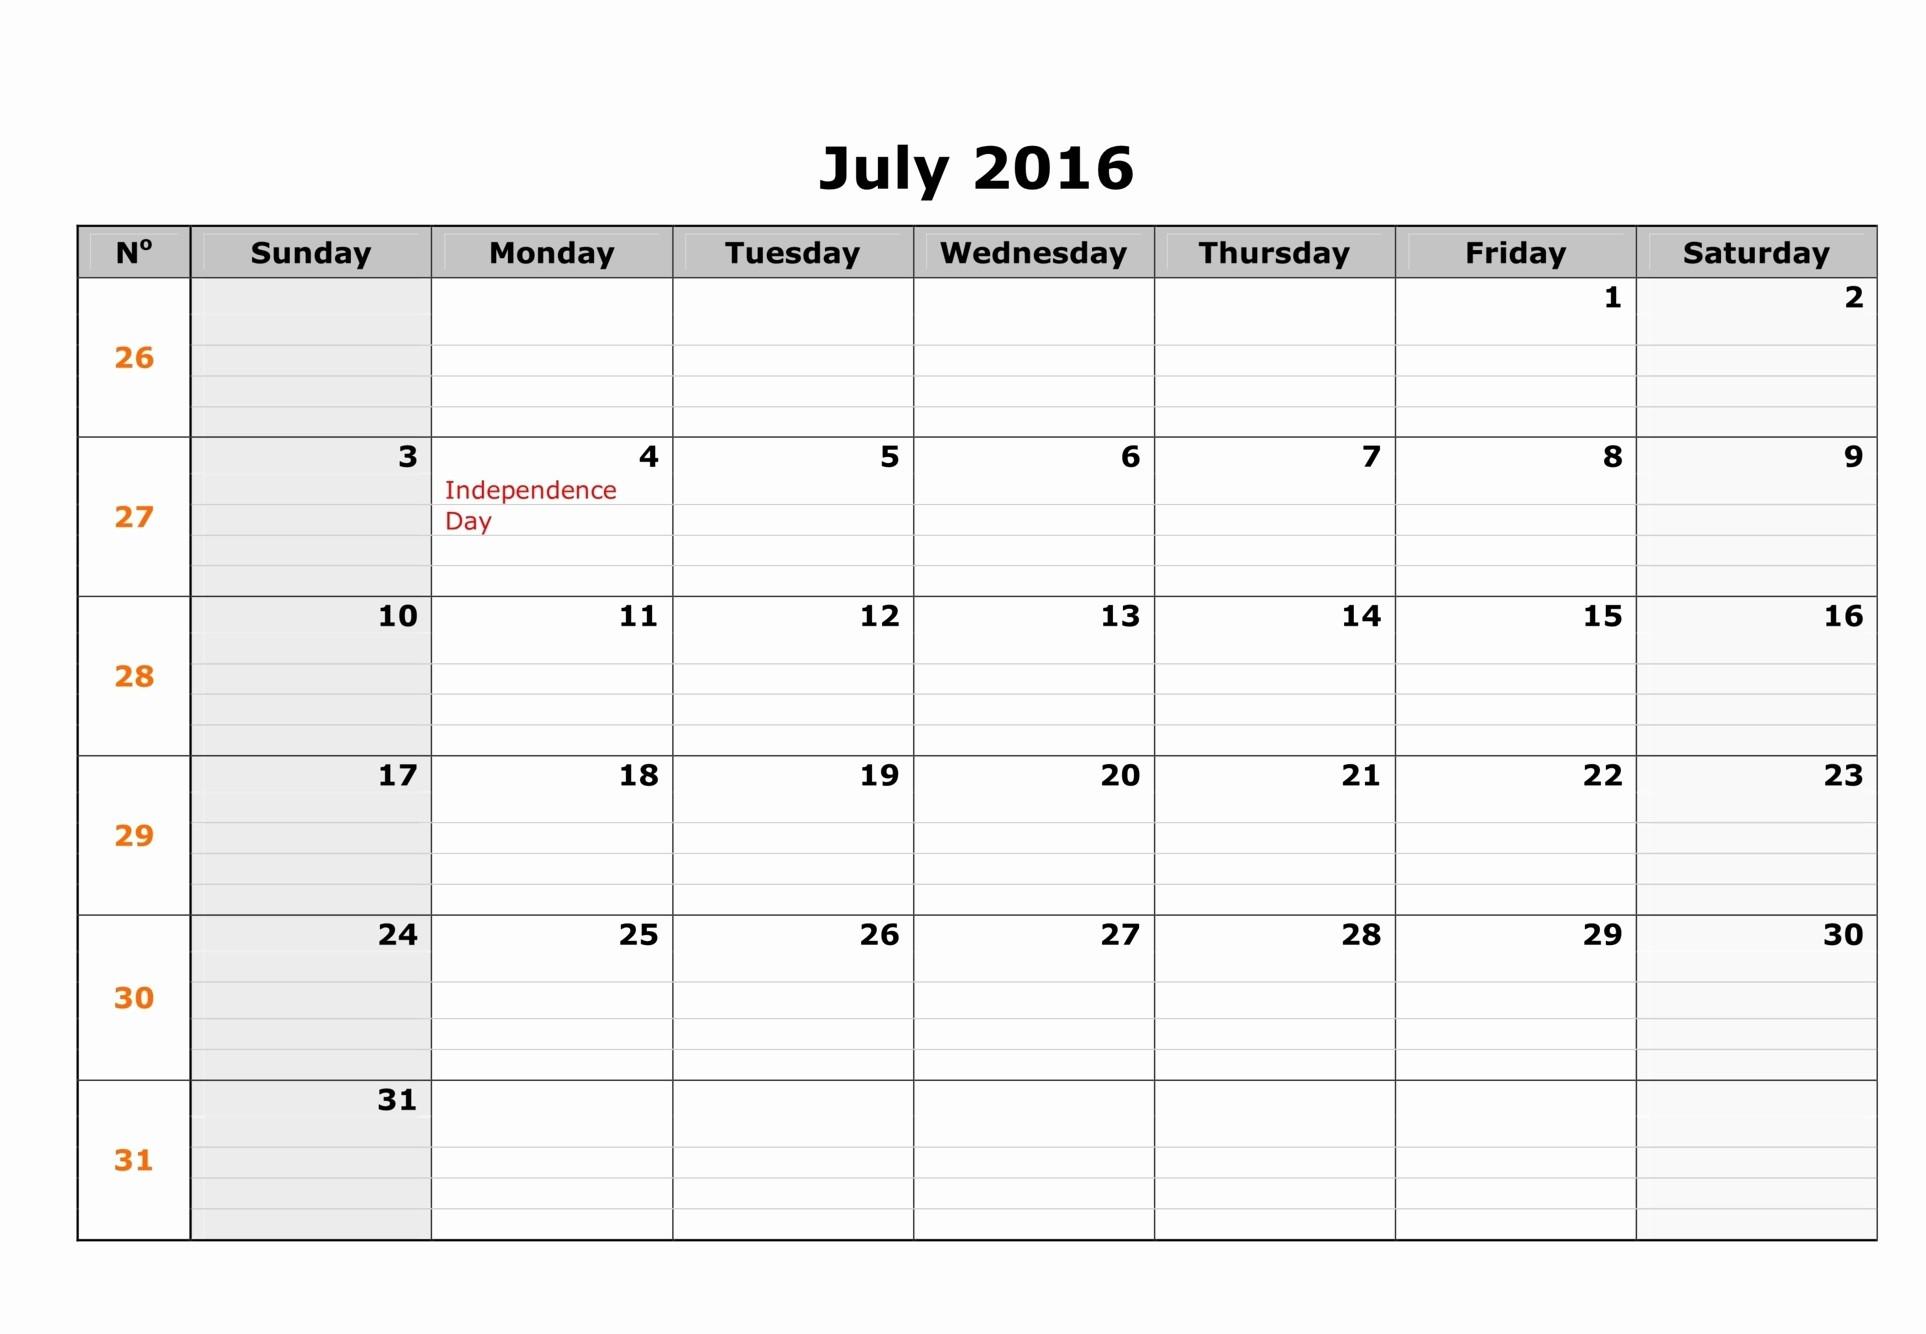 Free Printable Calendar 2016 Template Best Of Weekly July 2016 Calendar Templates